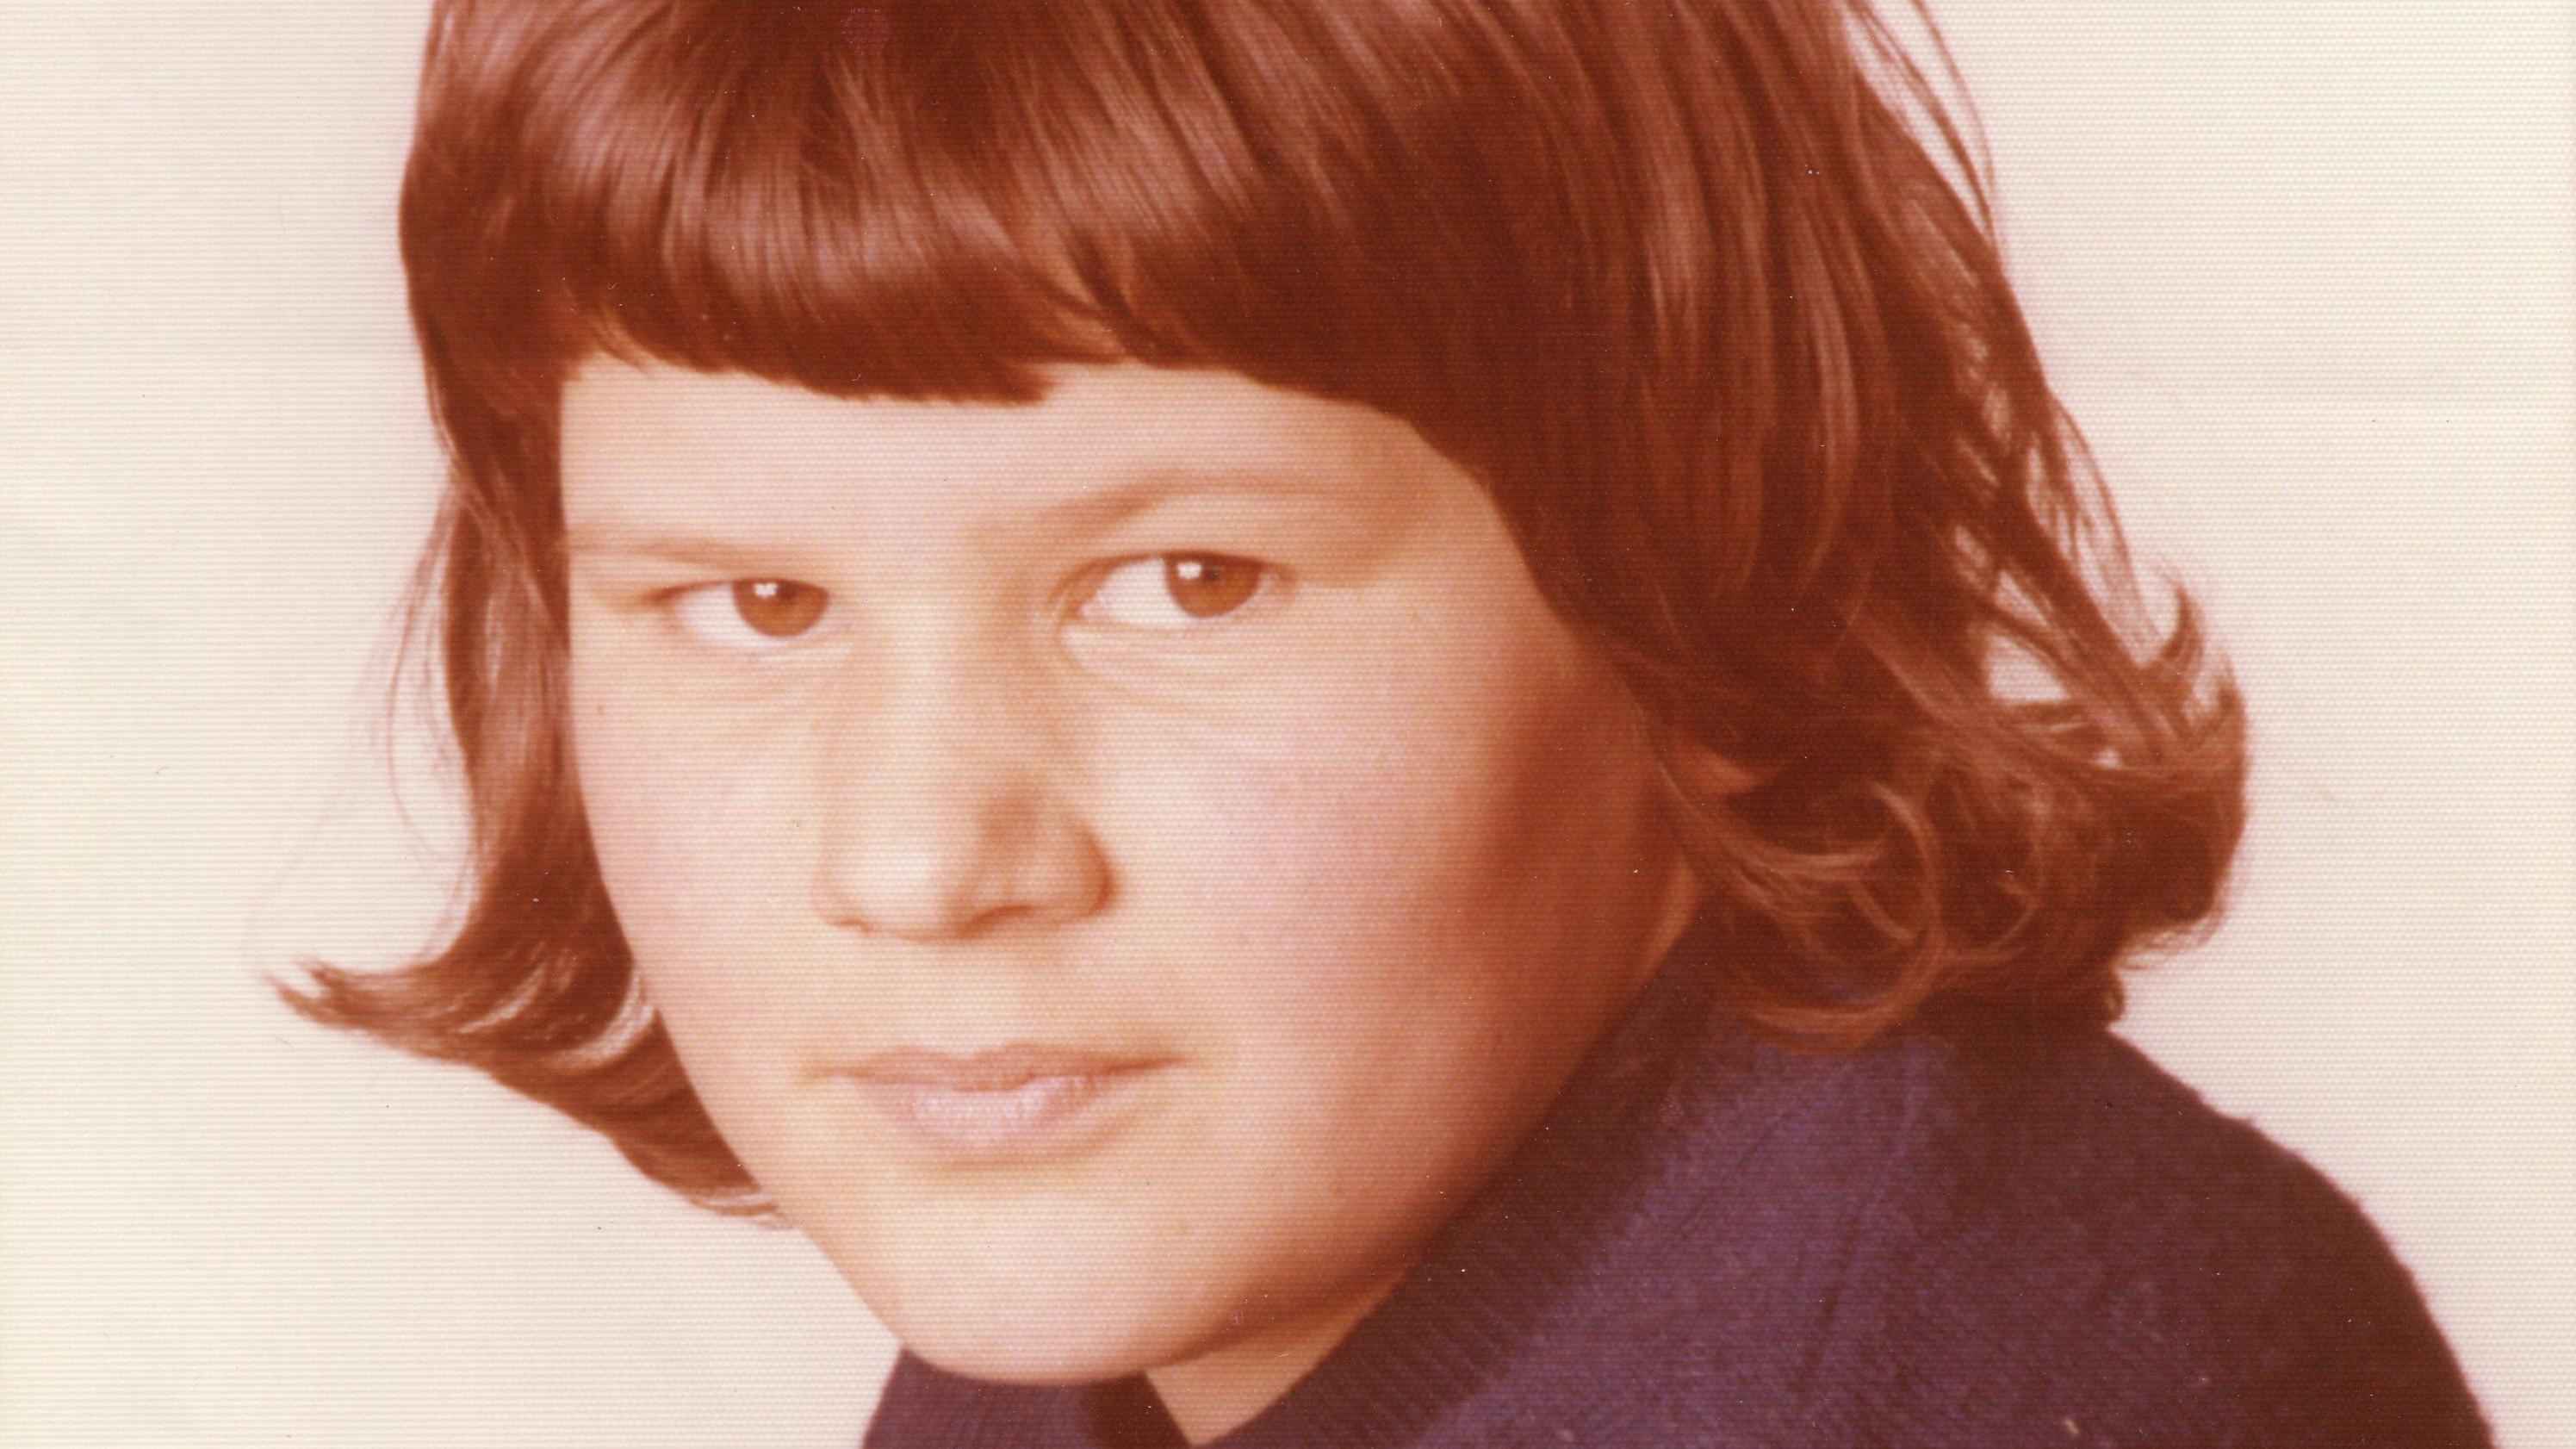 Monika Frischholz verschwand 1976 in Flossenbürg.